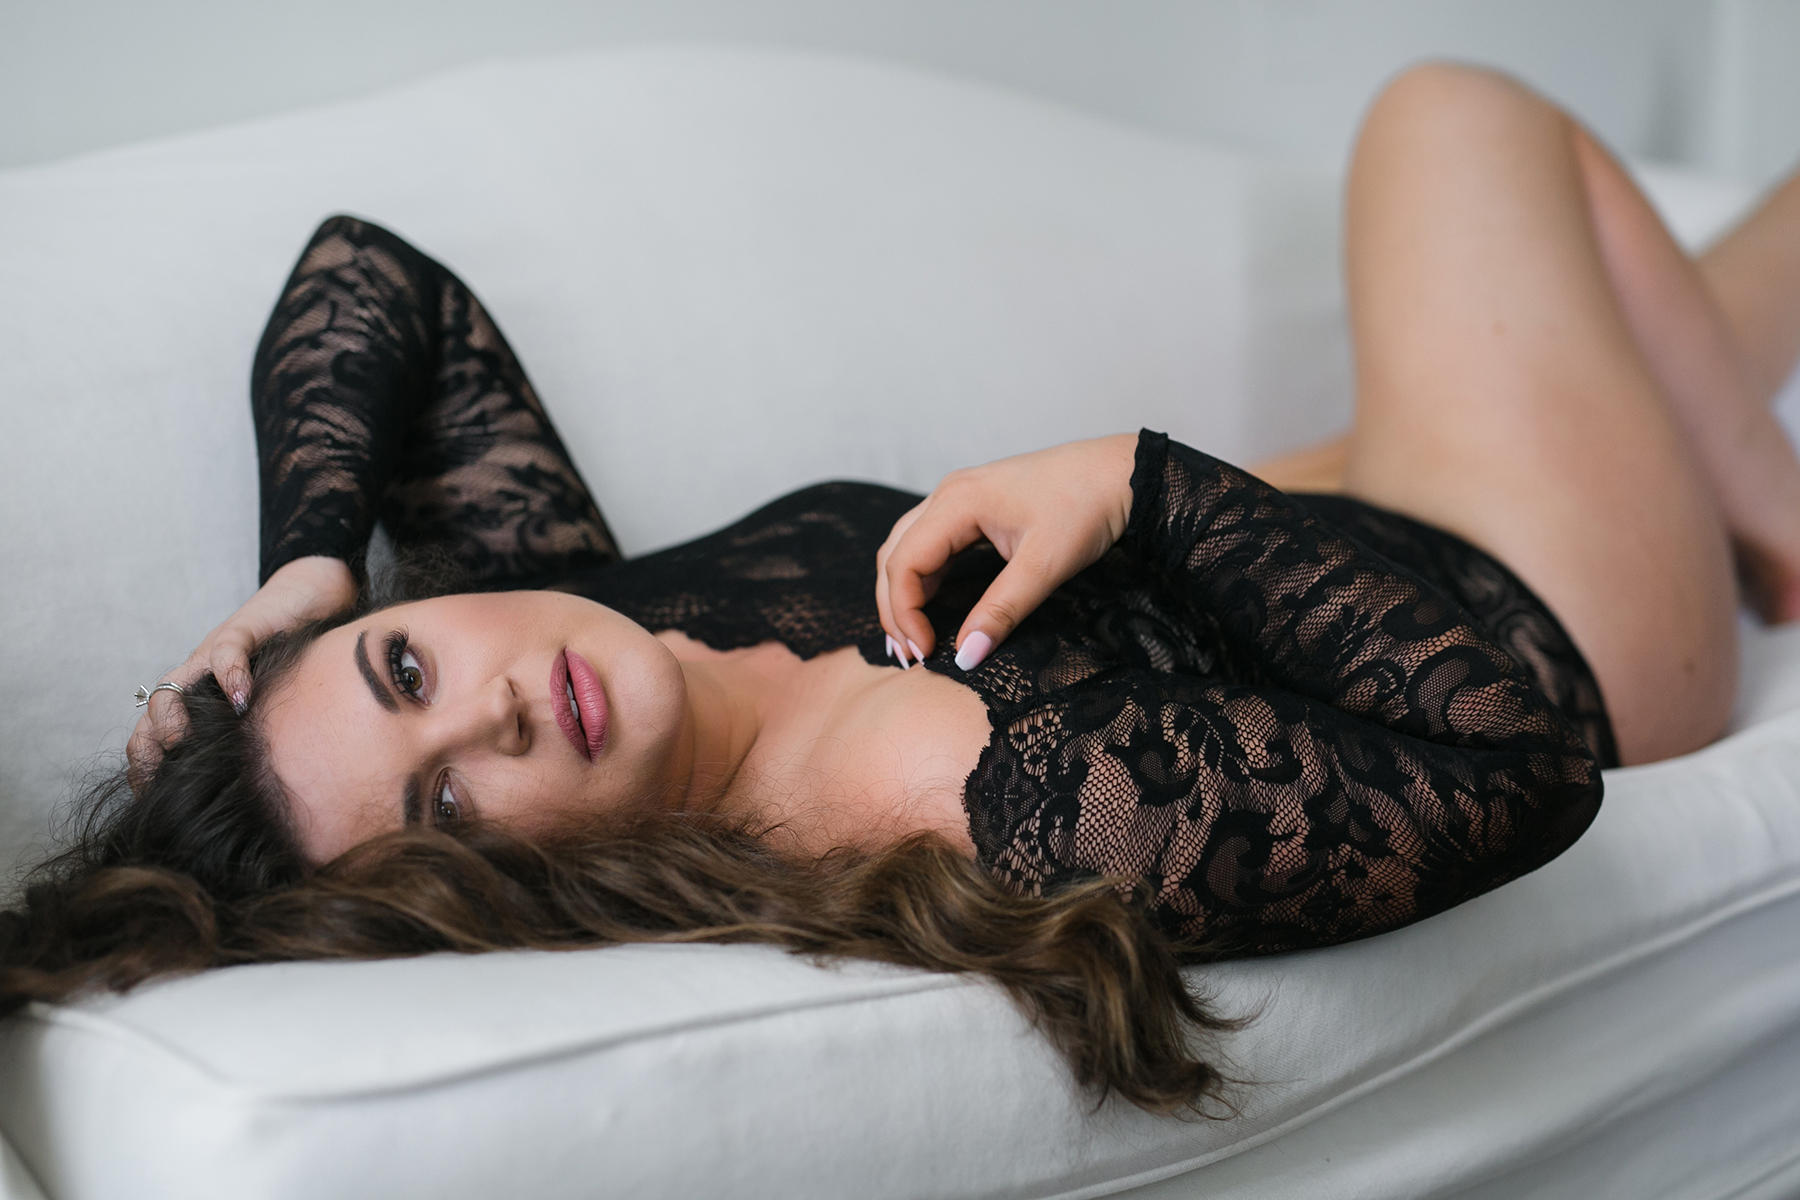 austin-tx-boudoir-photographer-photography-kimberly-brooke-15.jpg